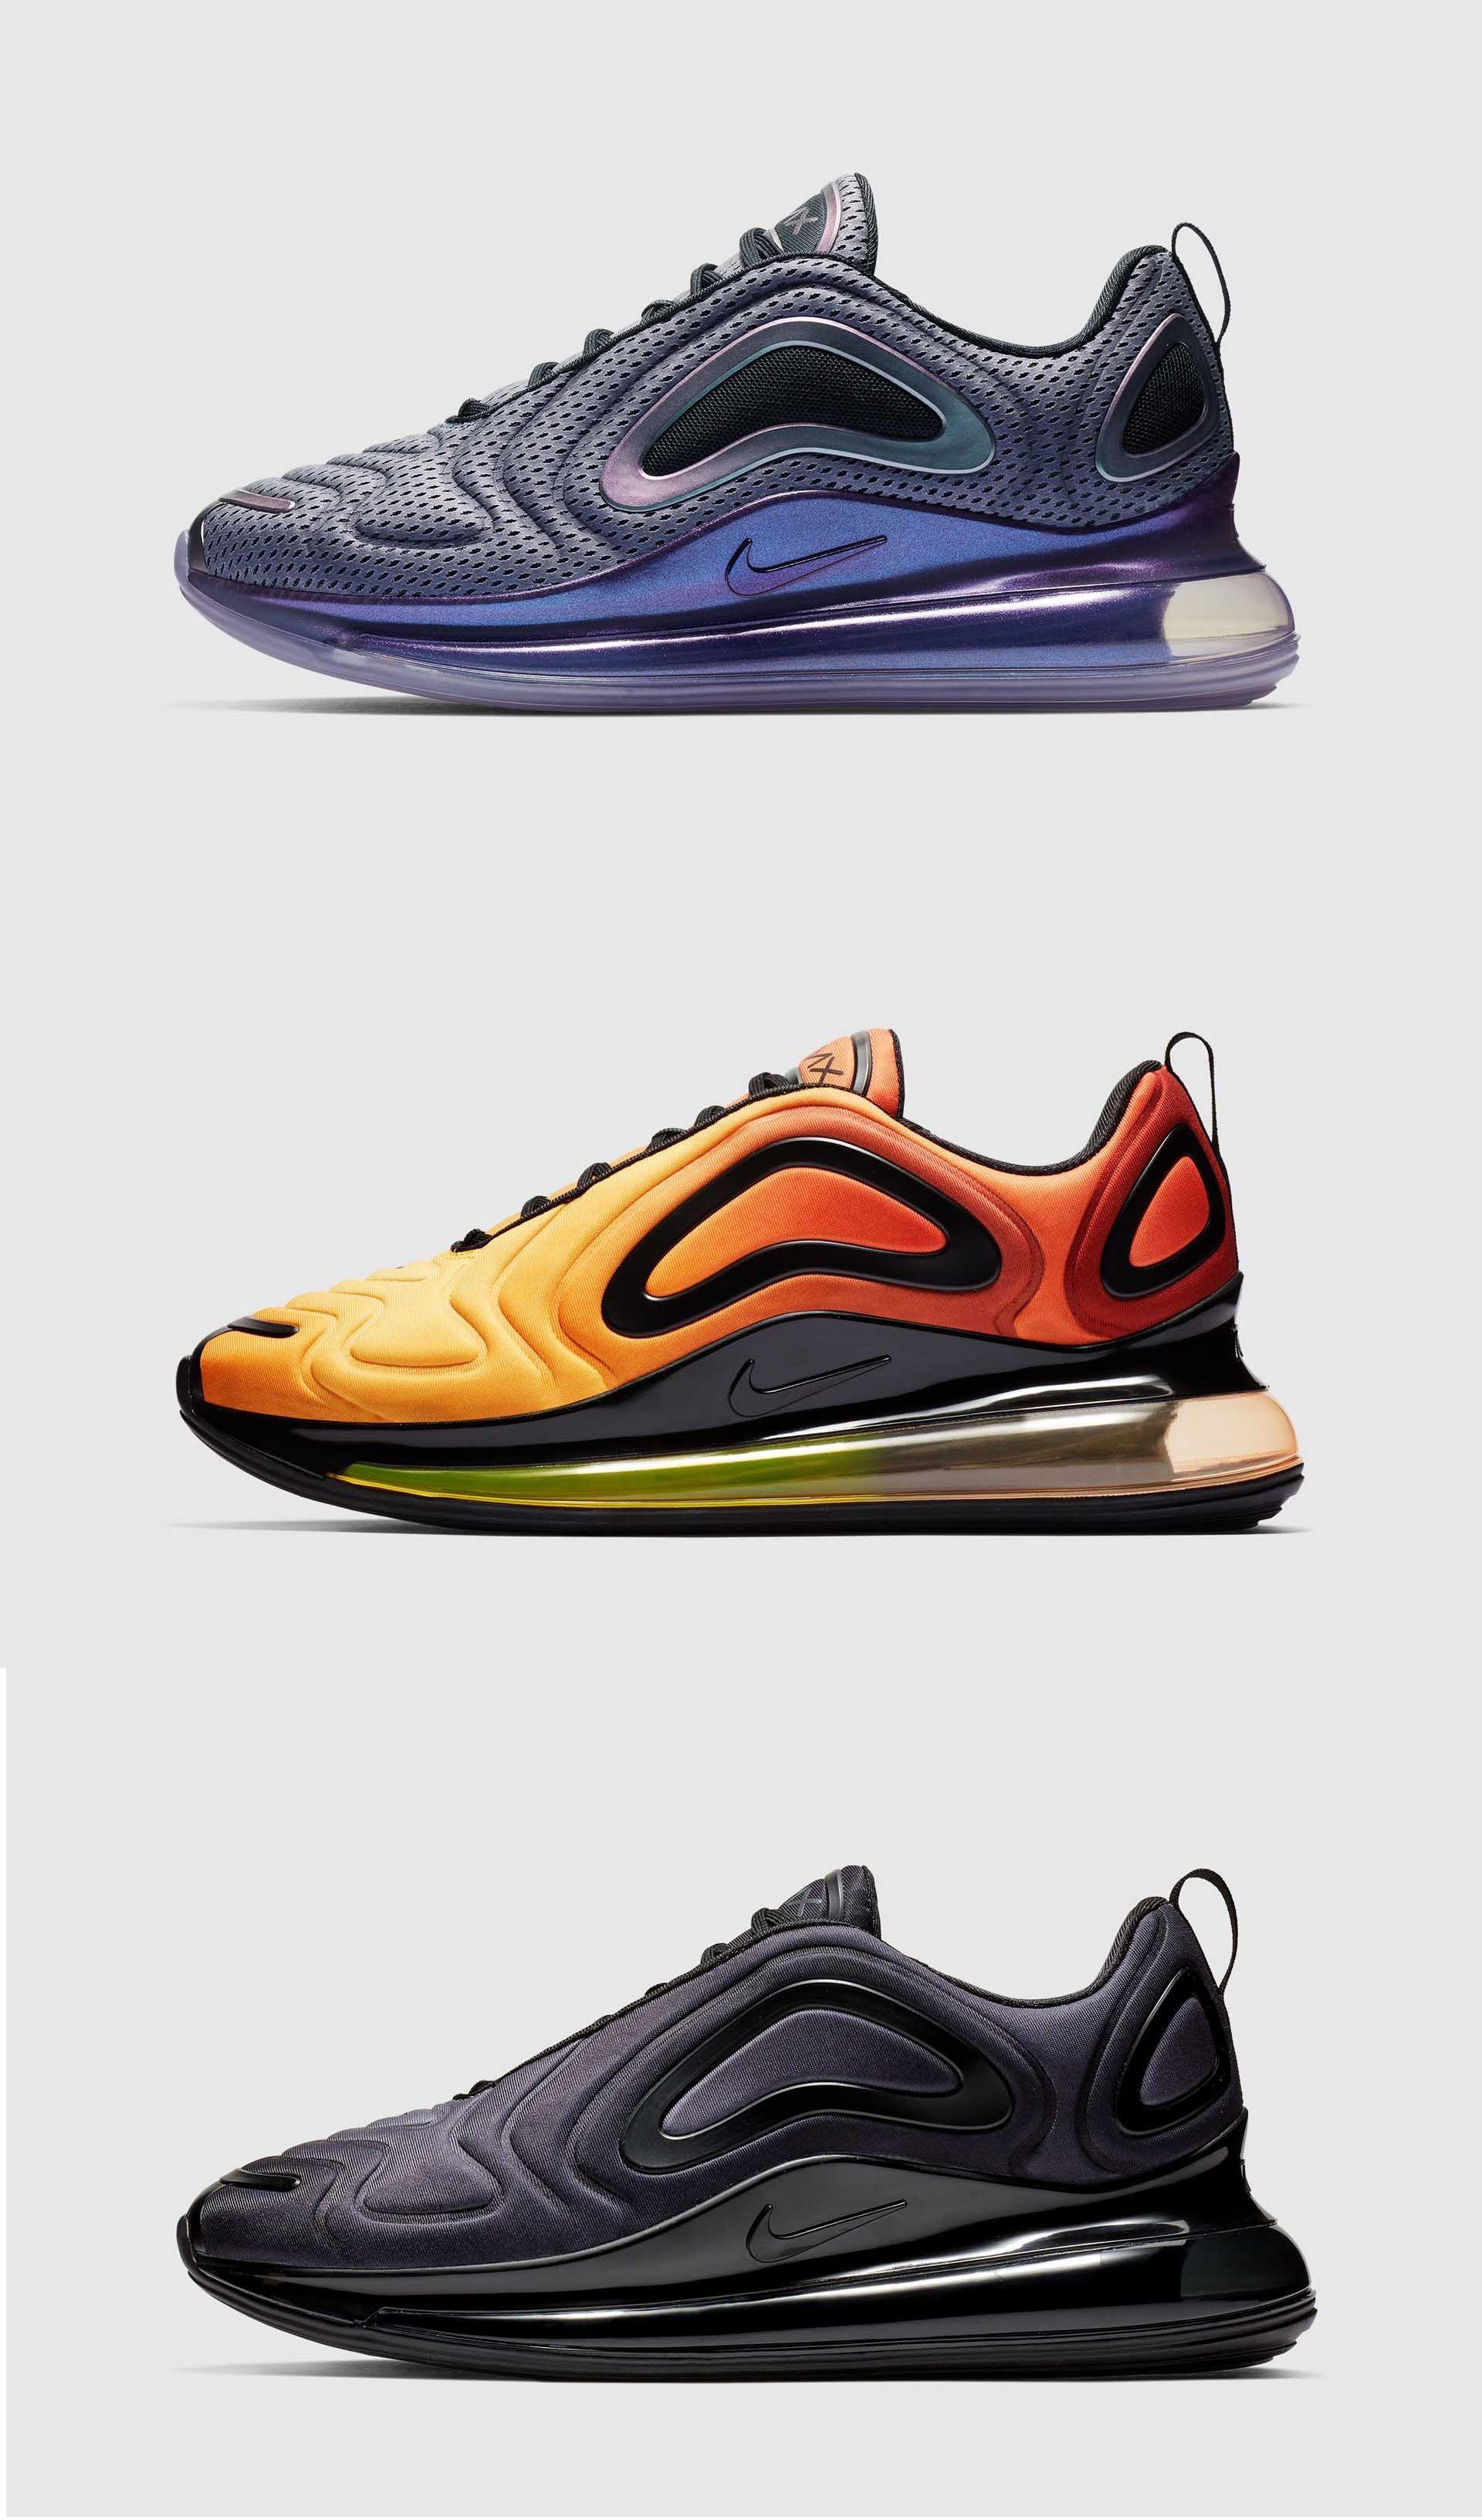 5f2e843110 Nike #AirMax 720 #Nears #Drop #Date The Nike Air Max 720 rides into ...